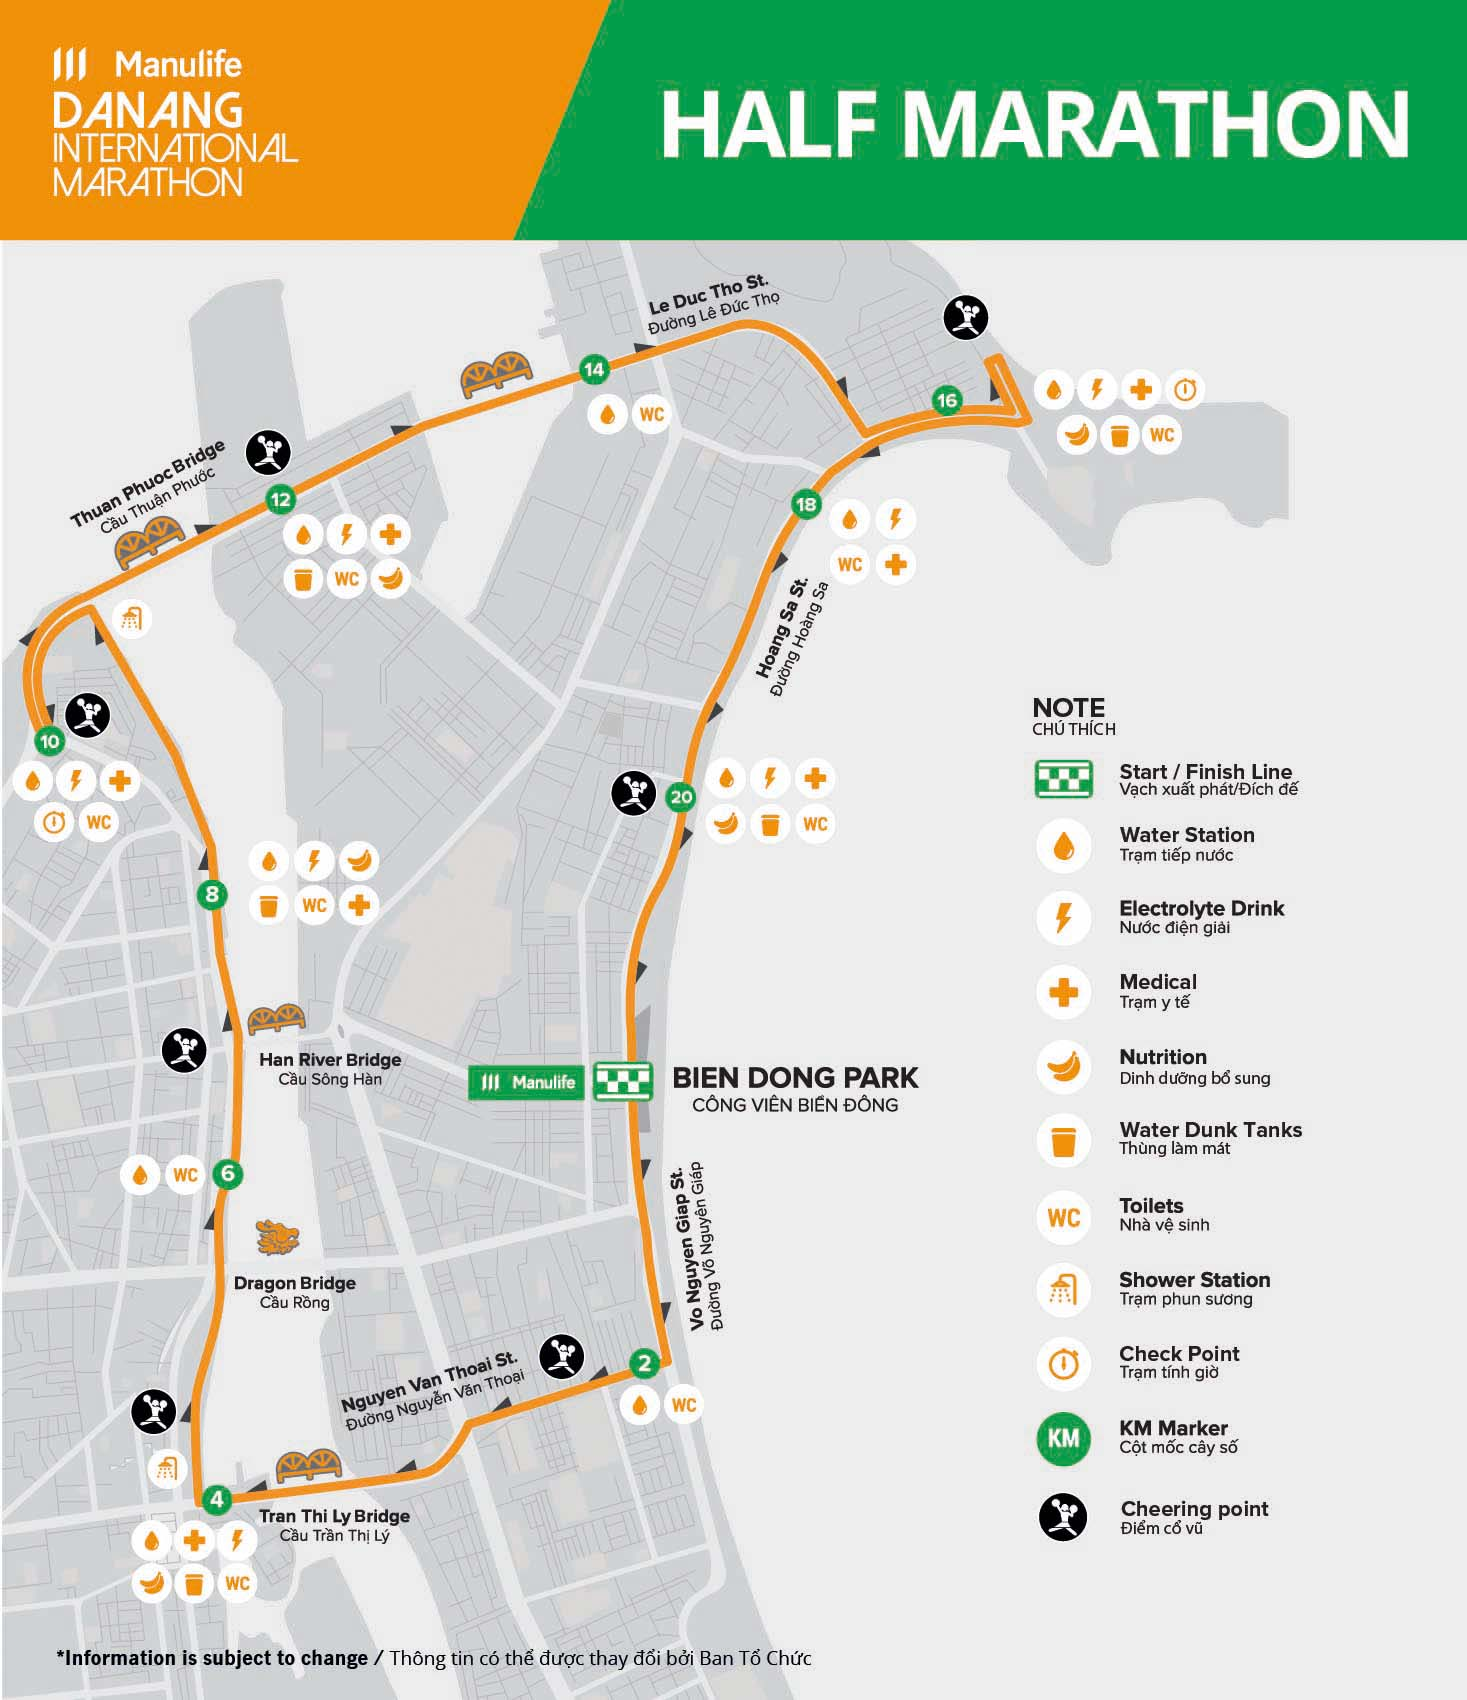 MDNIM20 - Course - Half Marathon